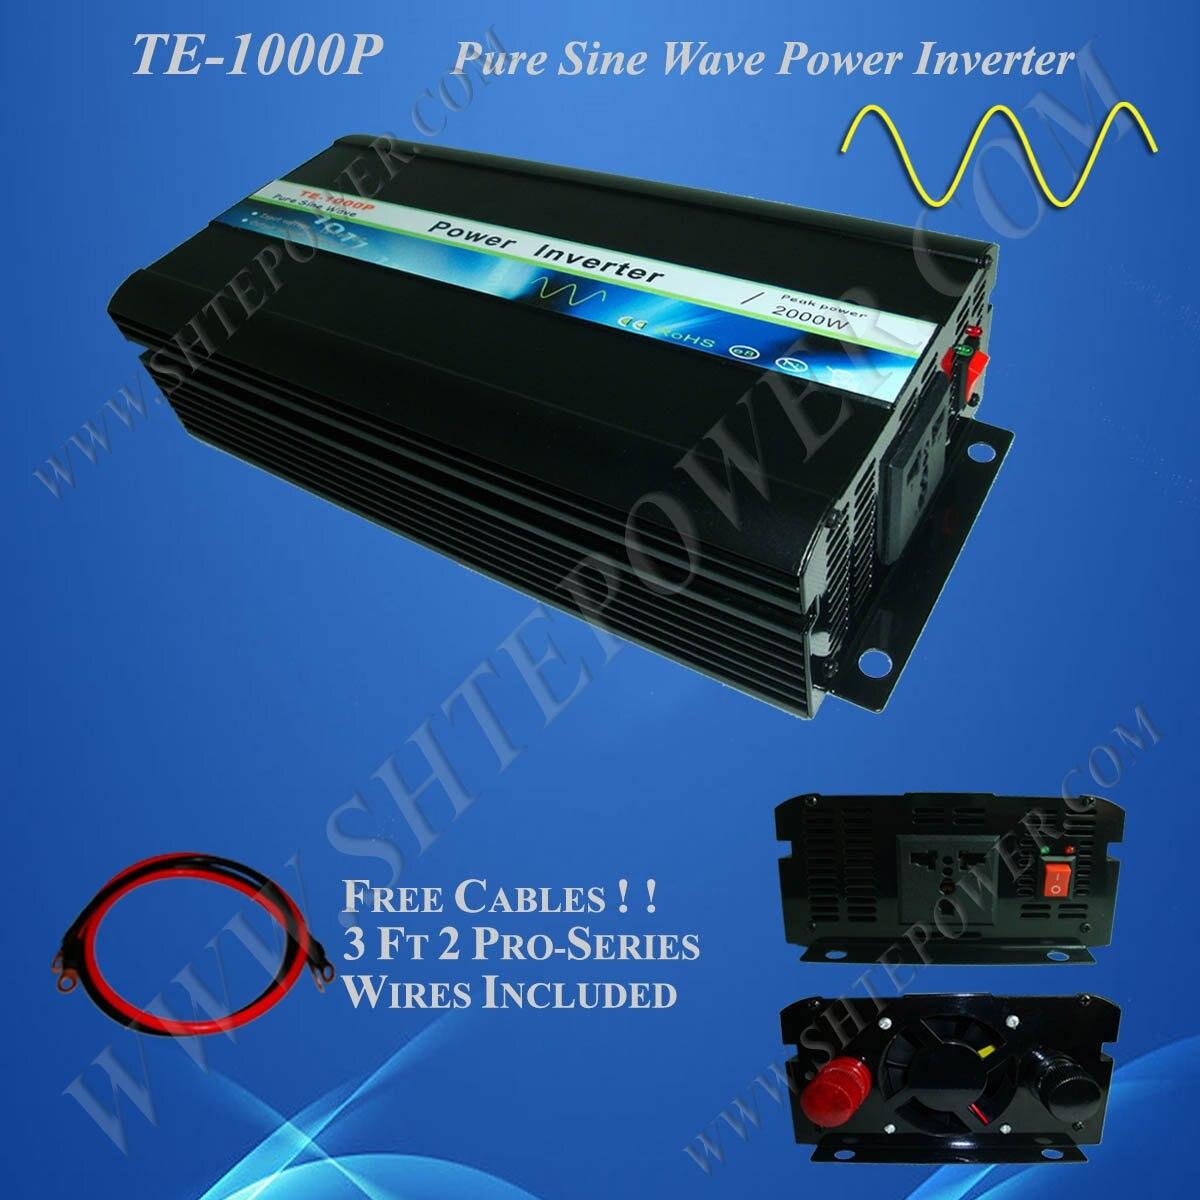 48VDC to 240VAC 1000watts Pure Sine Wave Power Inverter 1500w 48vdc to 100v 240vac pure sine wave power inverter